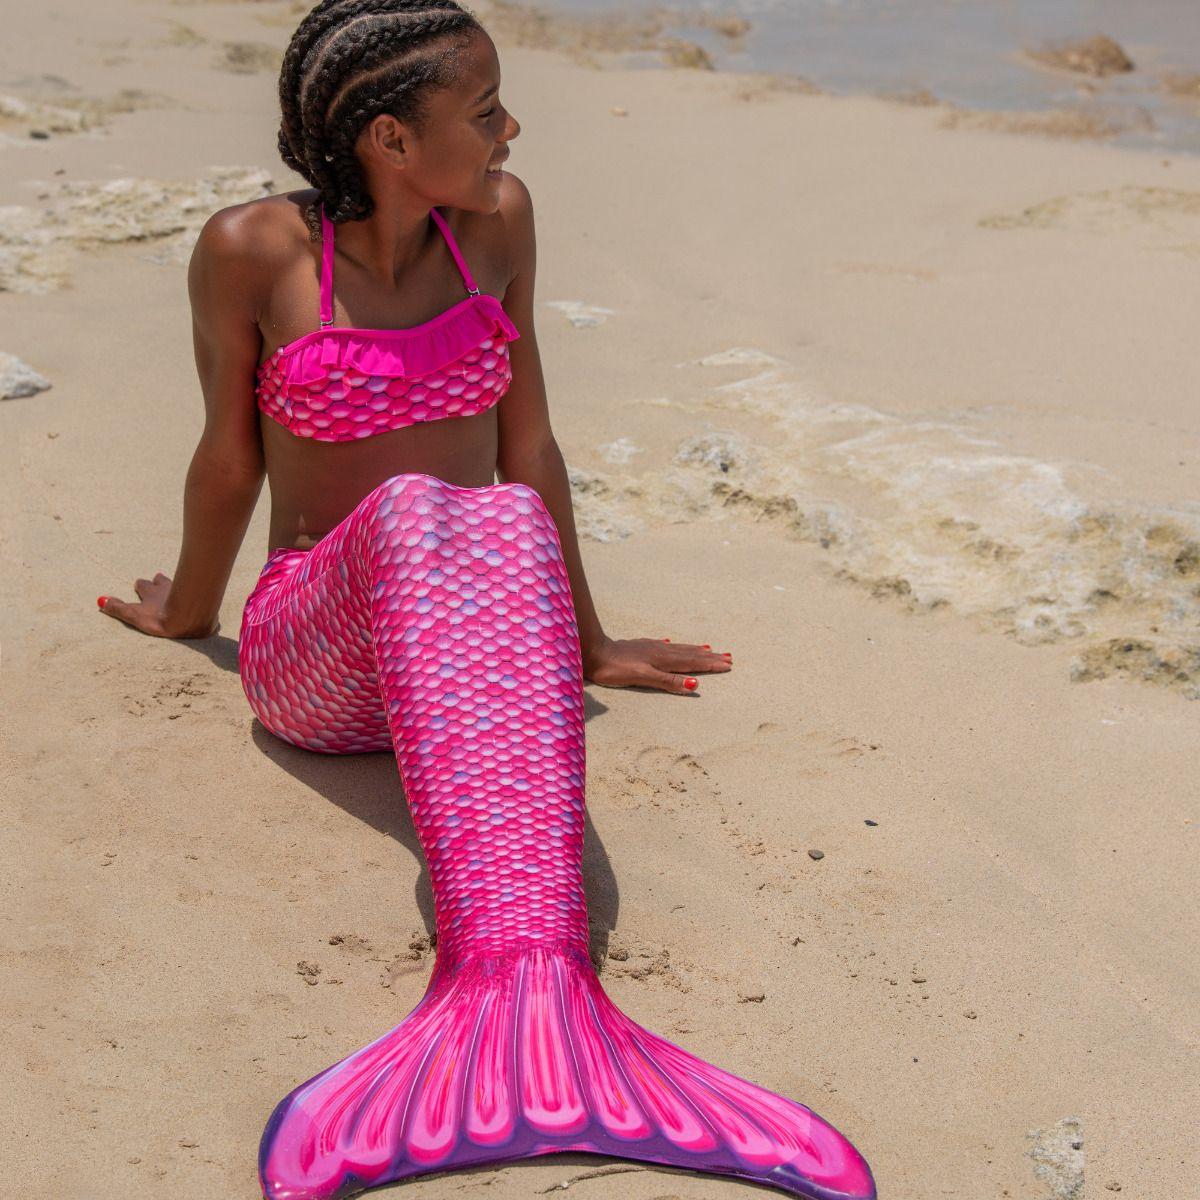 84a3e89811d4f Malibu Pink Mermaid Tail for Kids and Adults | Fin Fun